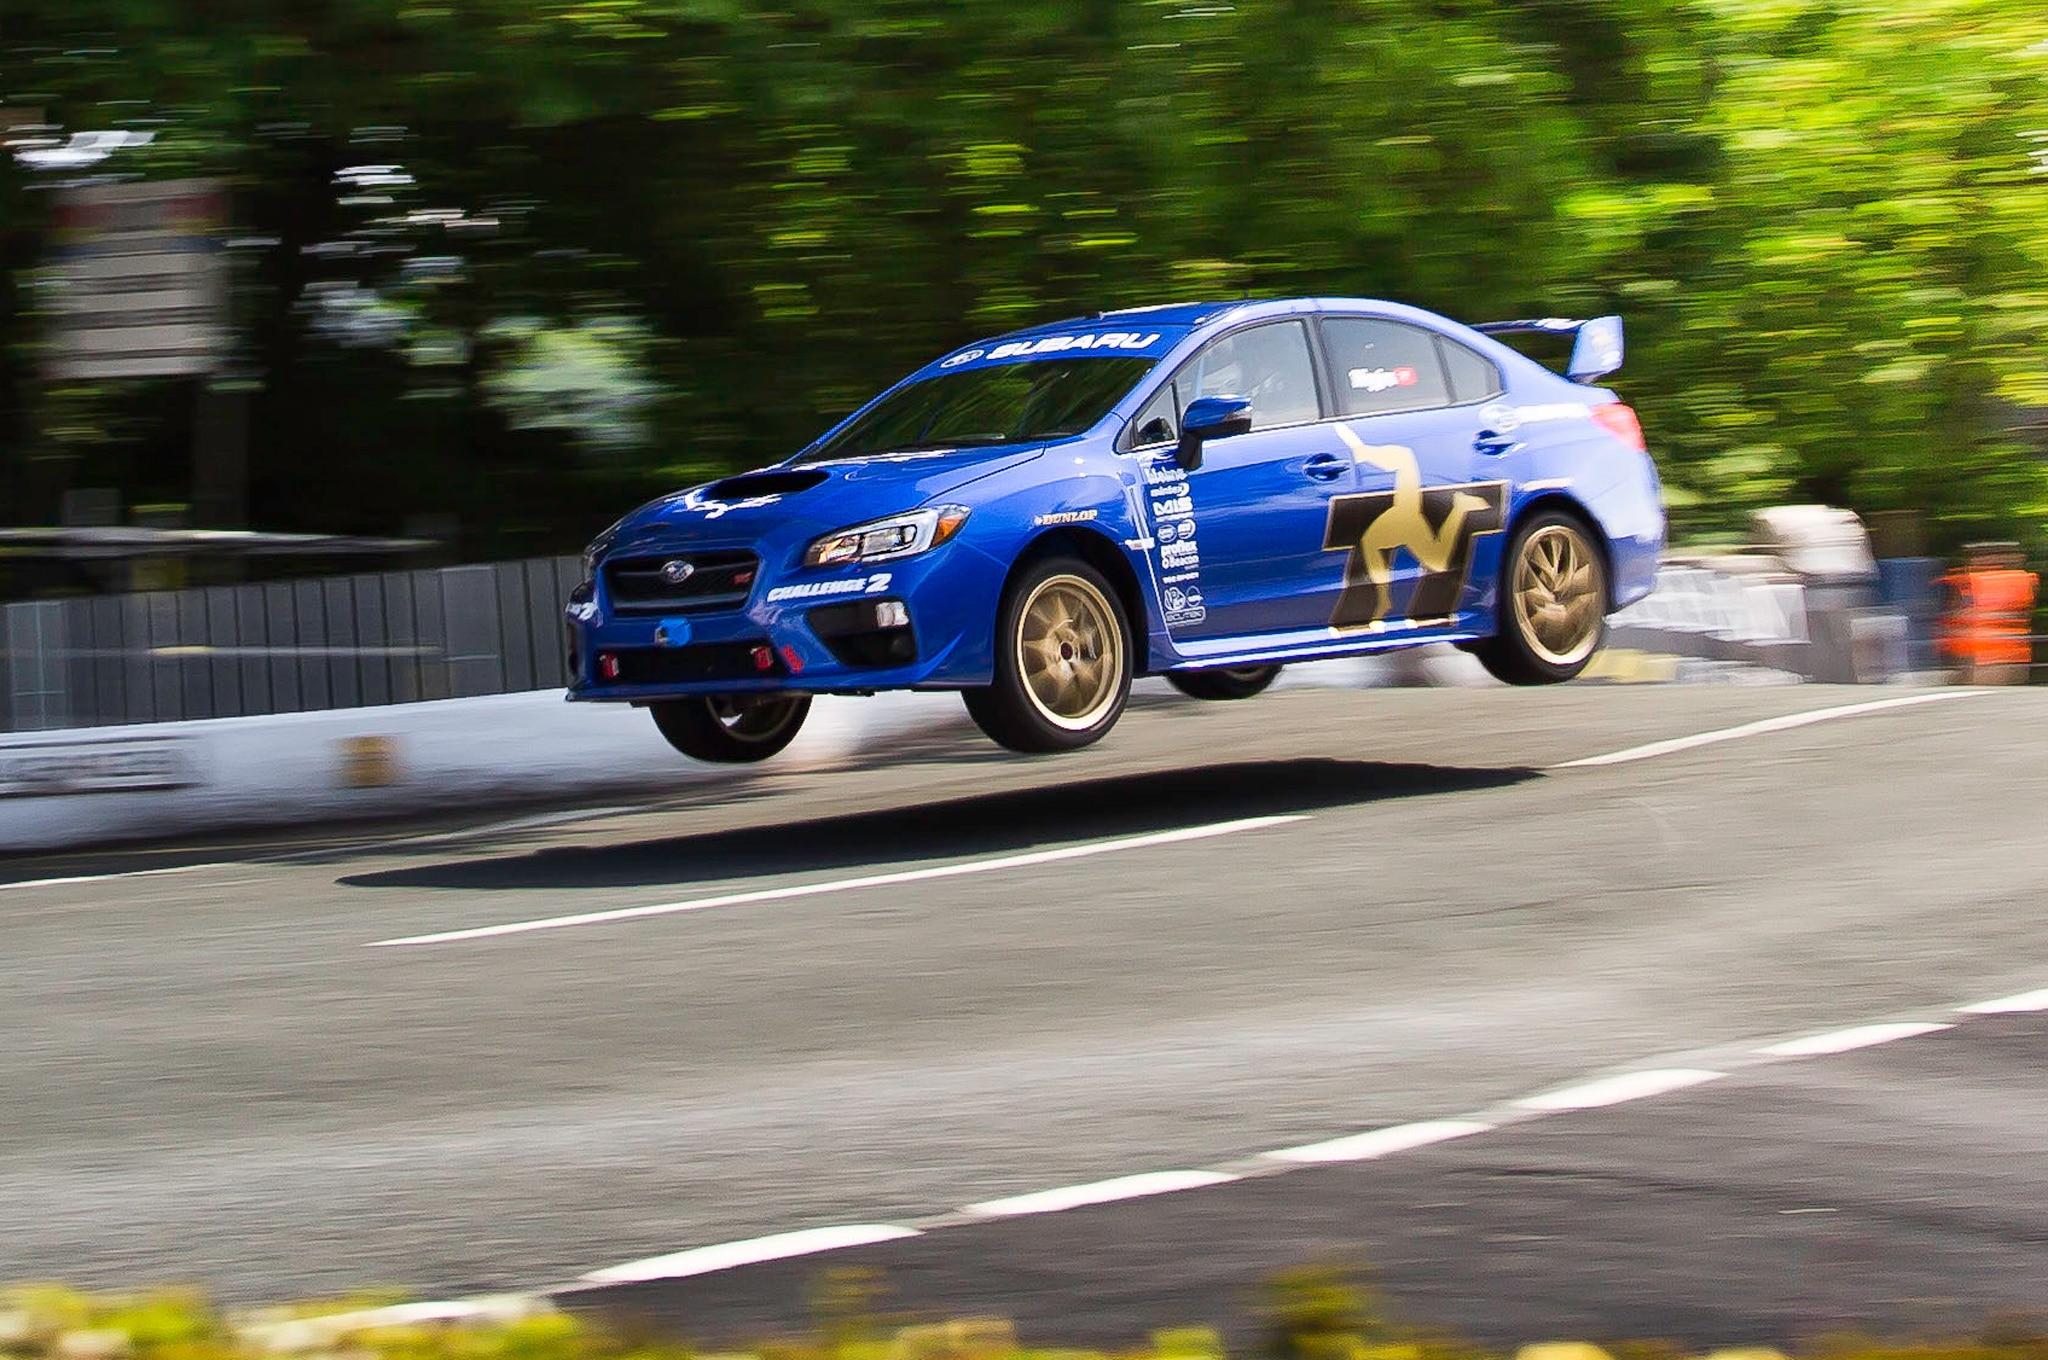 2015 Subaru WRX STI At Isle Of Man Jump Closer View1